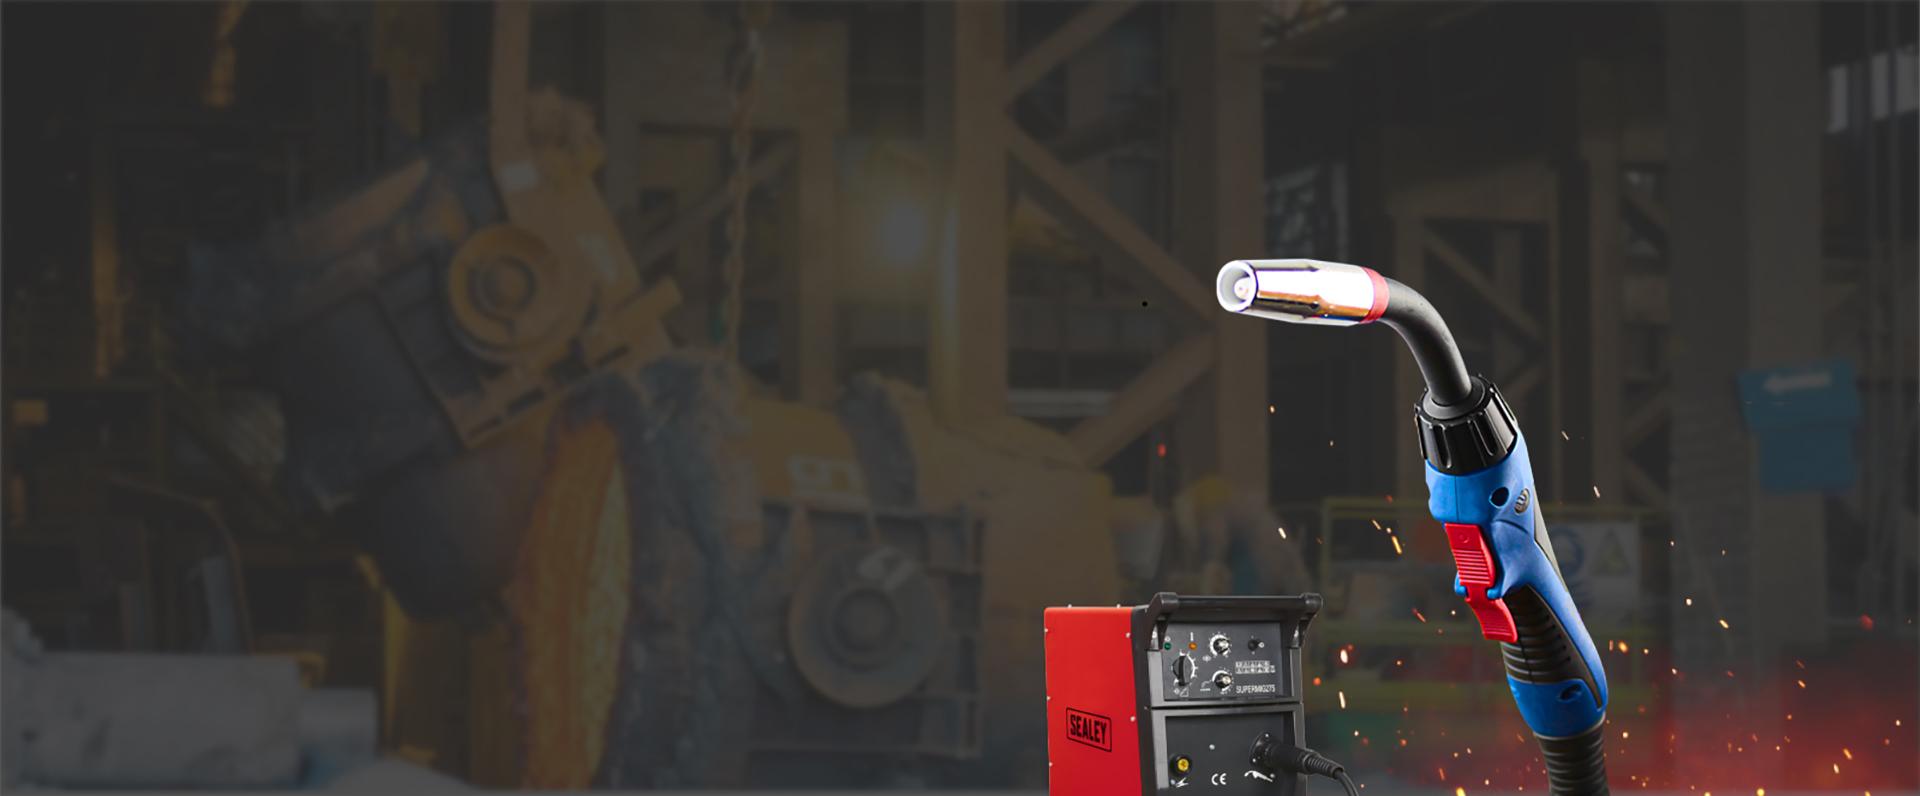 Технологическое превосходство в мире сварки  - Abicor Binzel